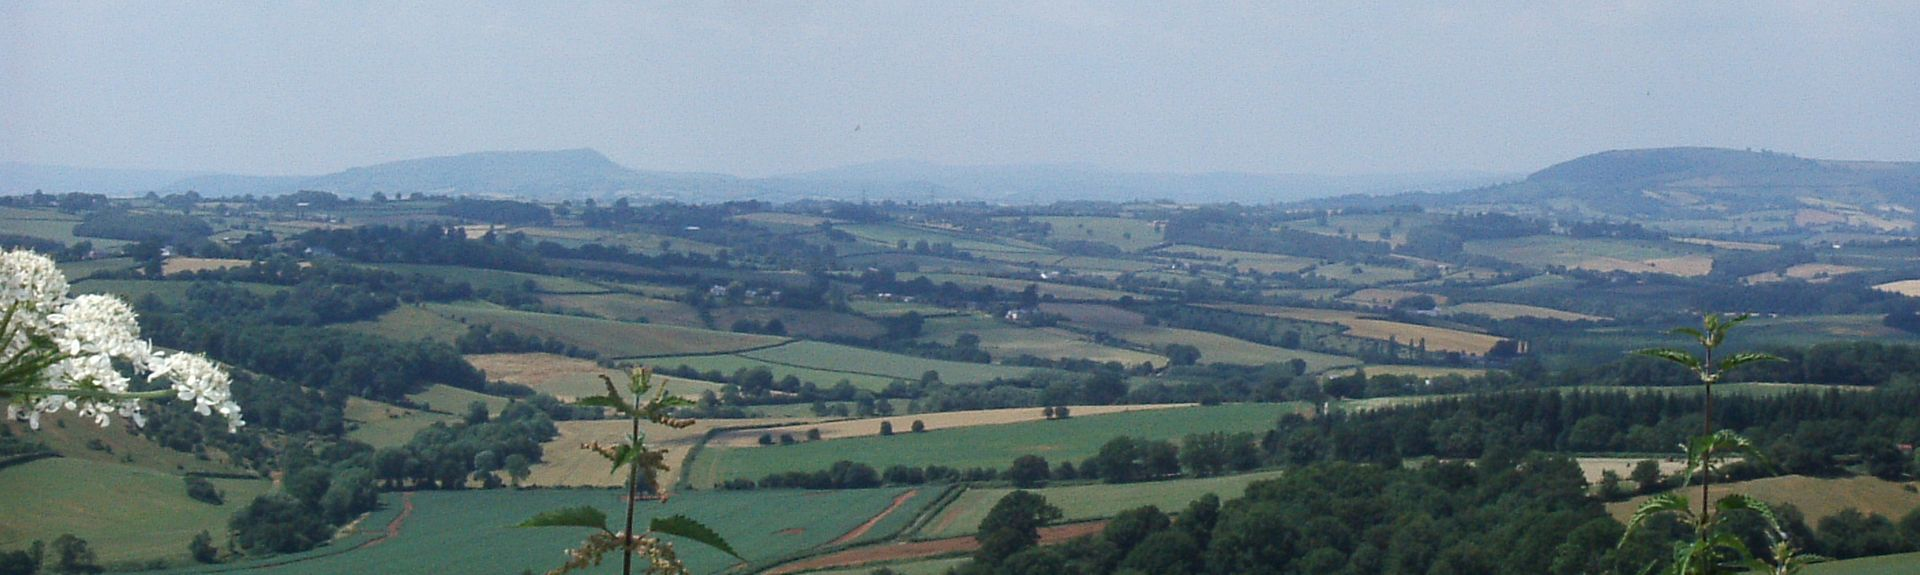 Llanfoist Fawr, Monmouthshire, UK